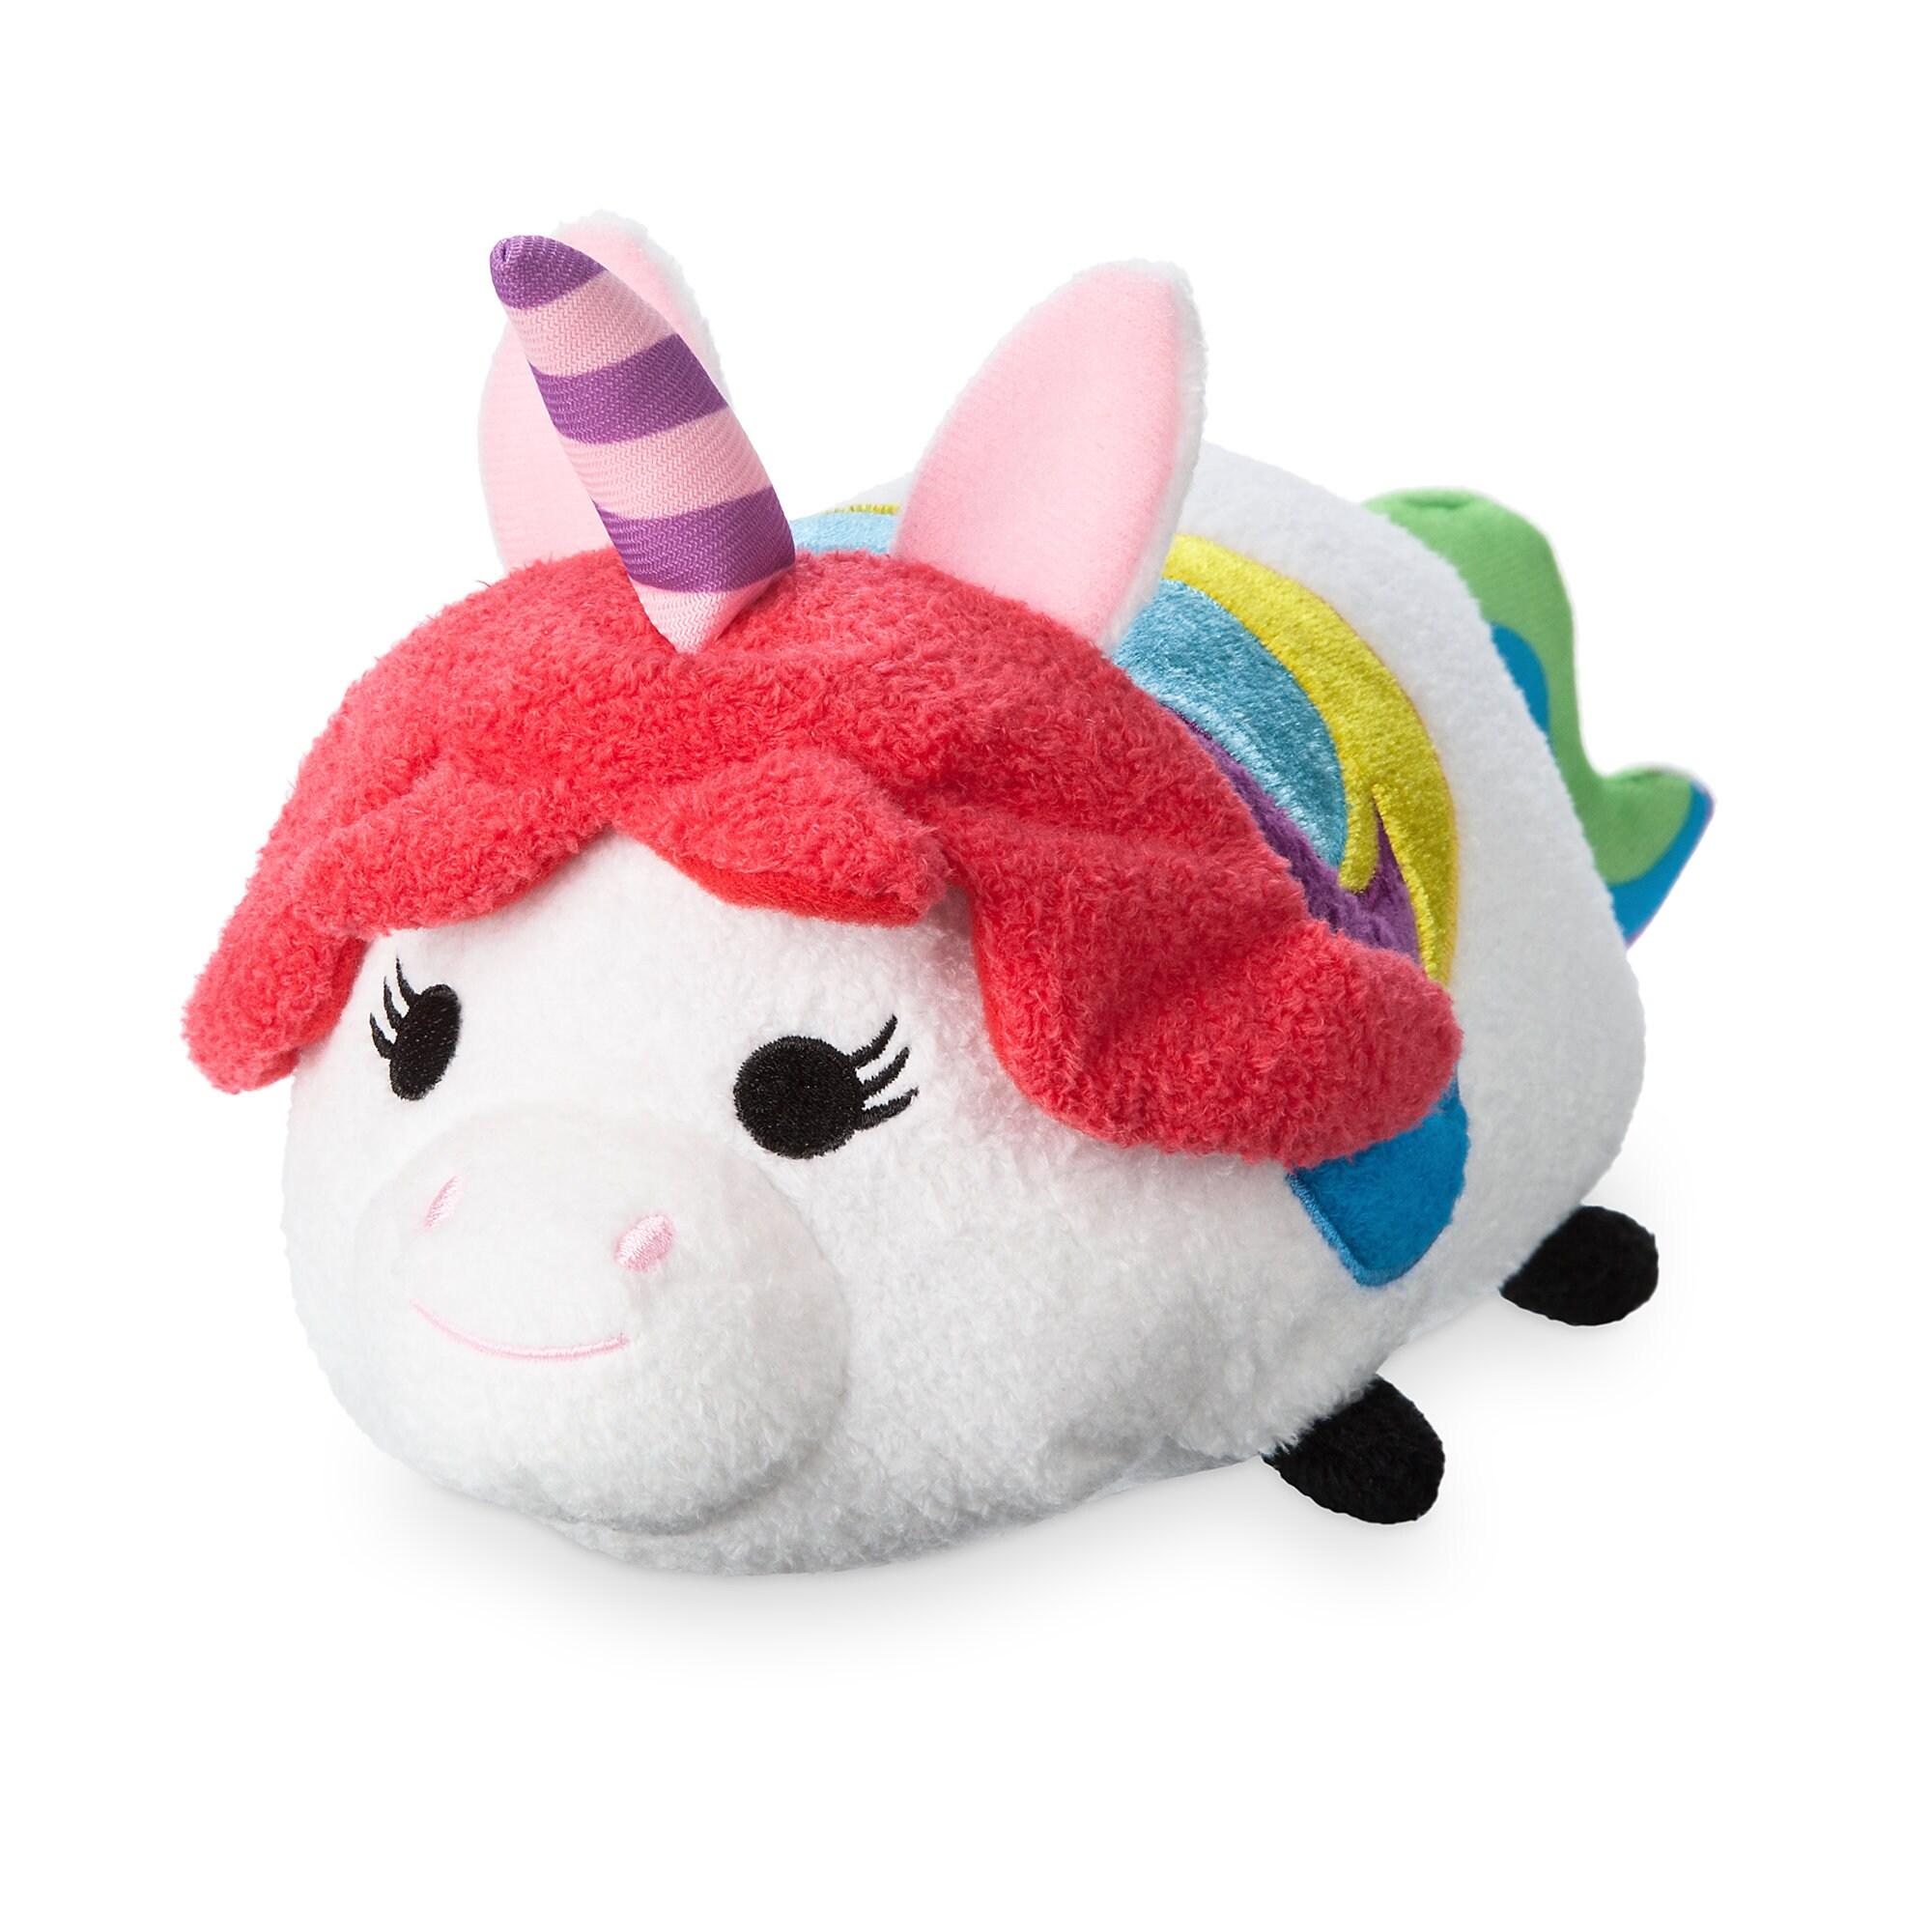 Rainbow Unicorn ''Tsum Tsum'' Plush - Inside Out - Medium